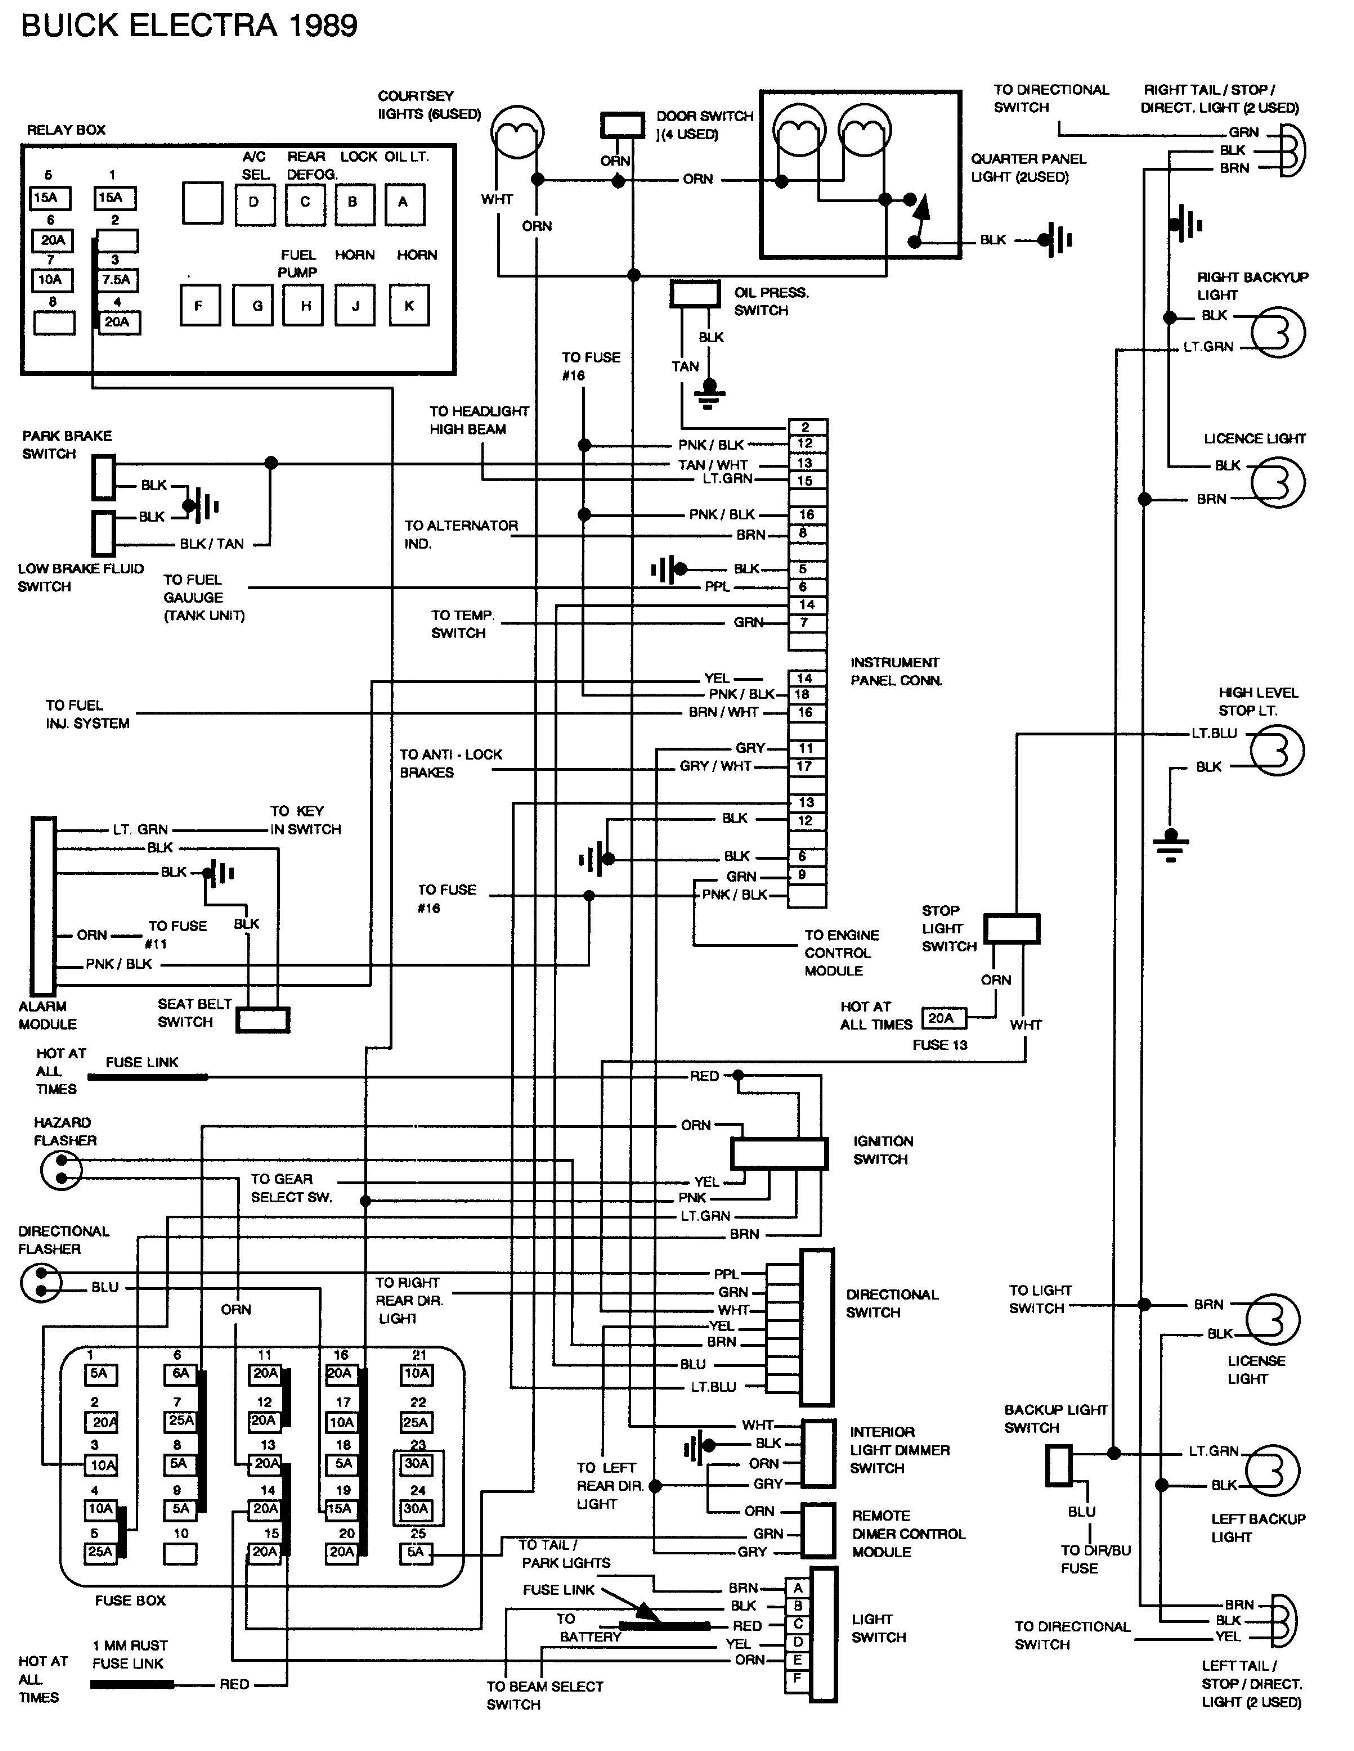 Oldsmobile Alero Engine Diagram 2000 Oldsmobile Cutlass Supreme Radio Wiring Diagram Worksheet and Of Oldsmobile Alero Engine Diagram